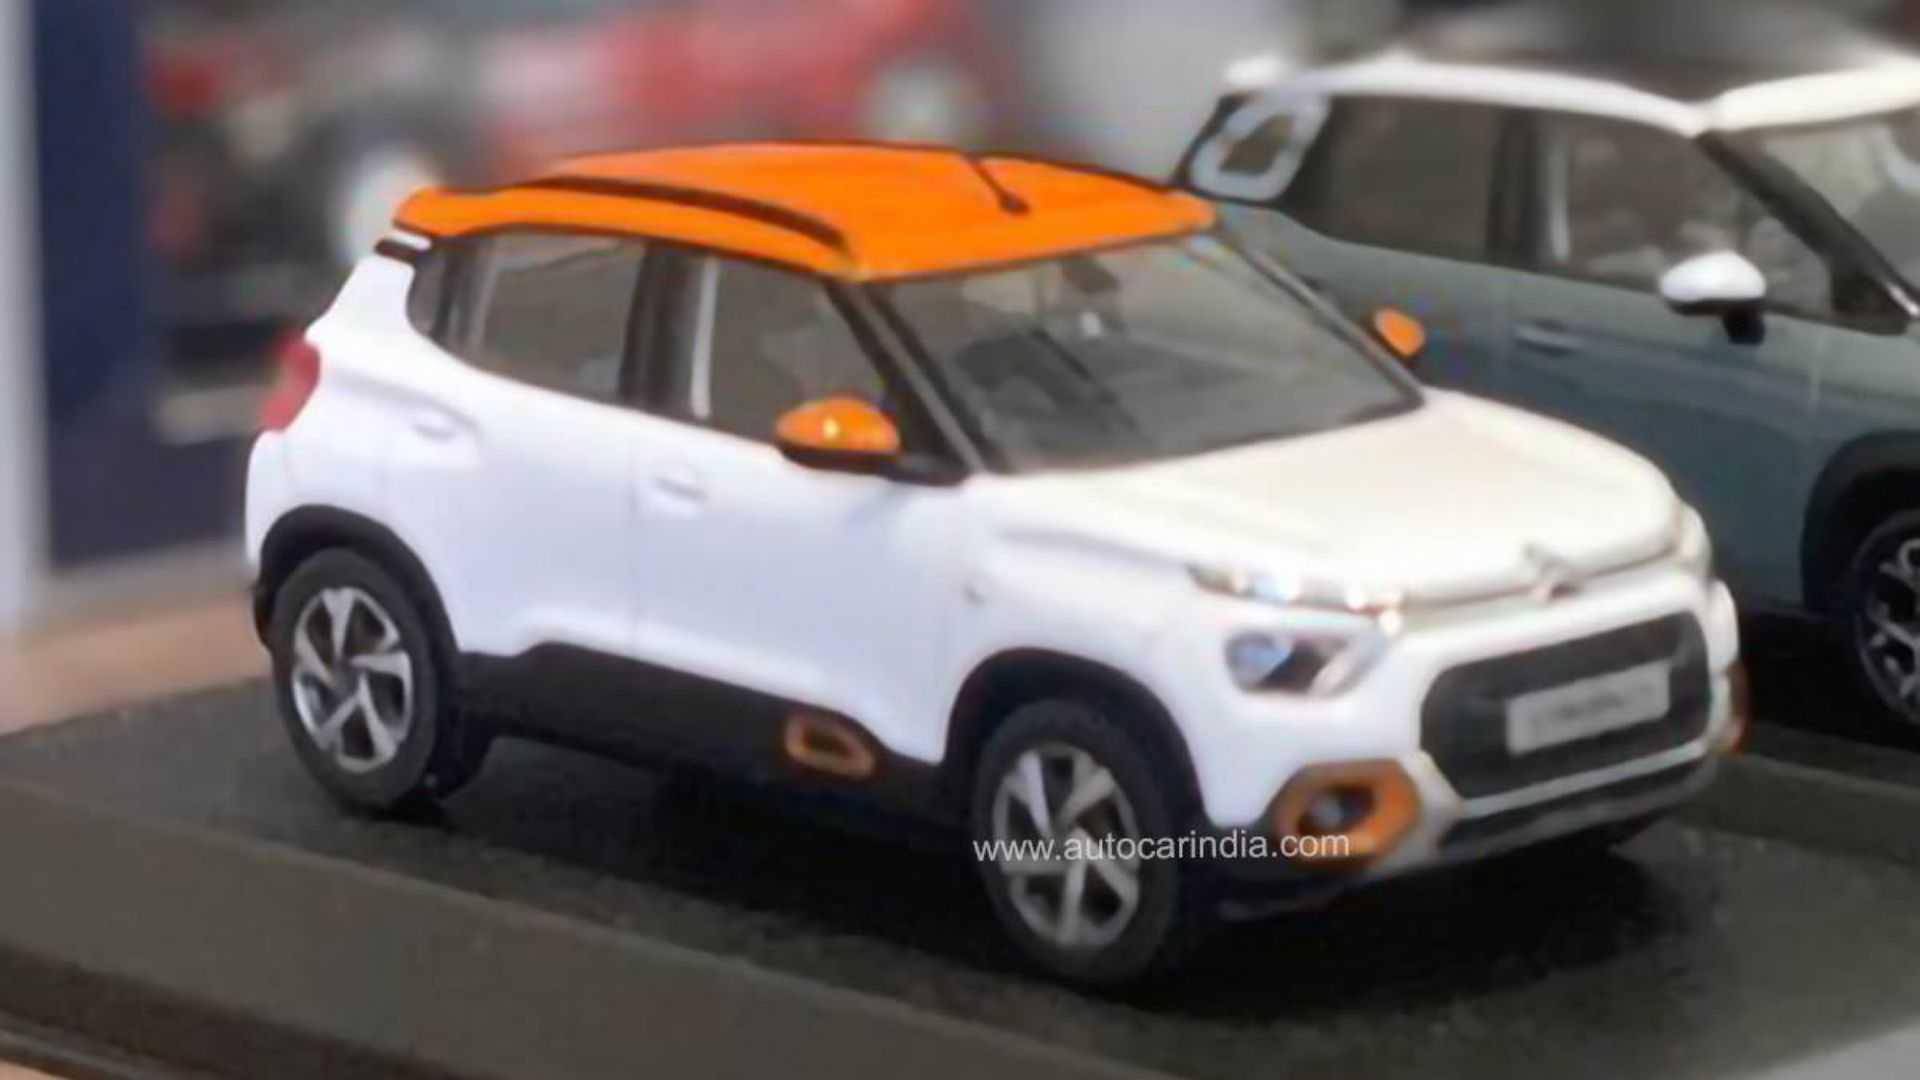 Novo Citroën C3 Autocar Índia Oficial